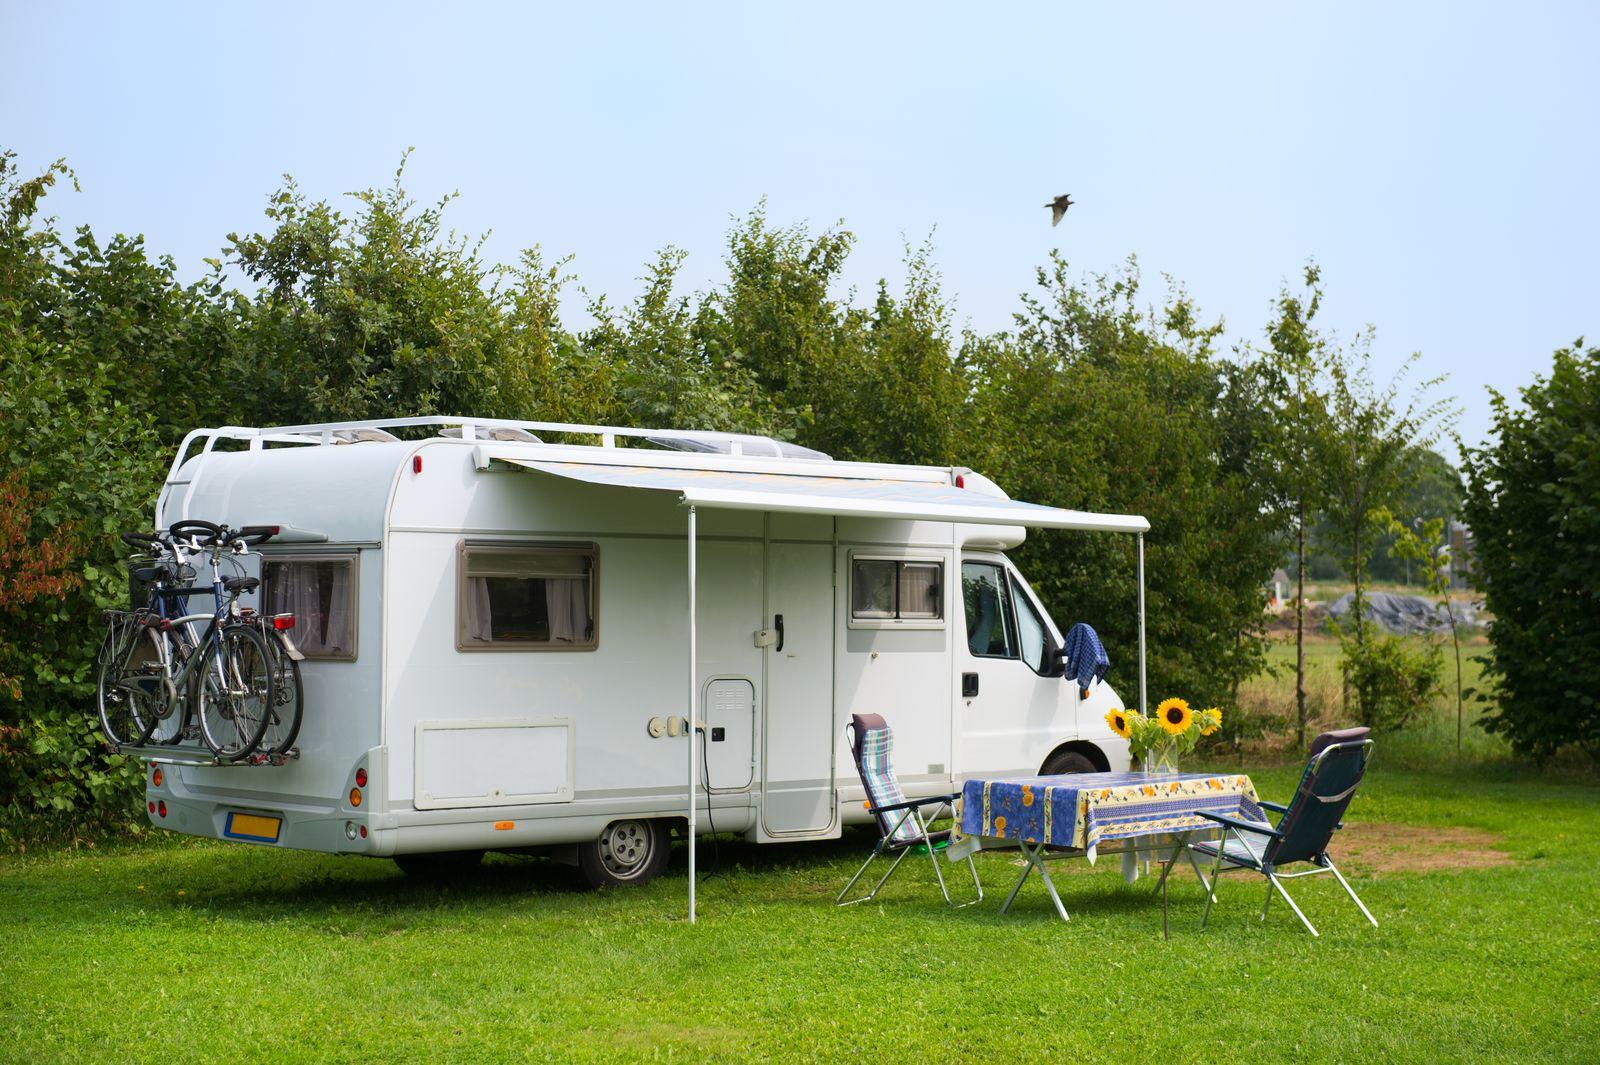 Afbeelding van Camperplaats groot